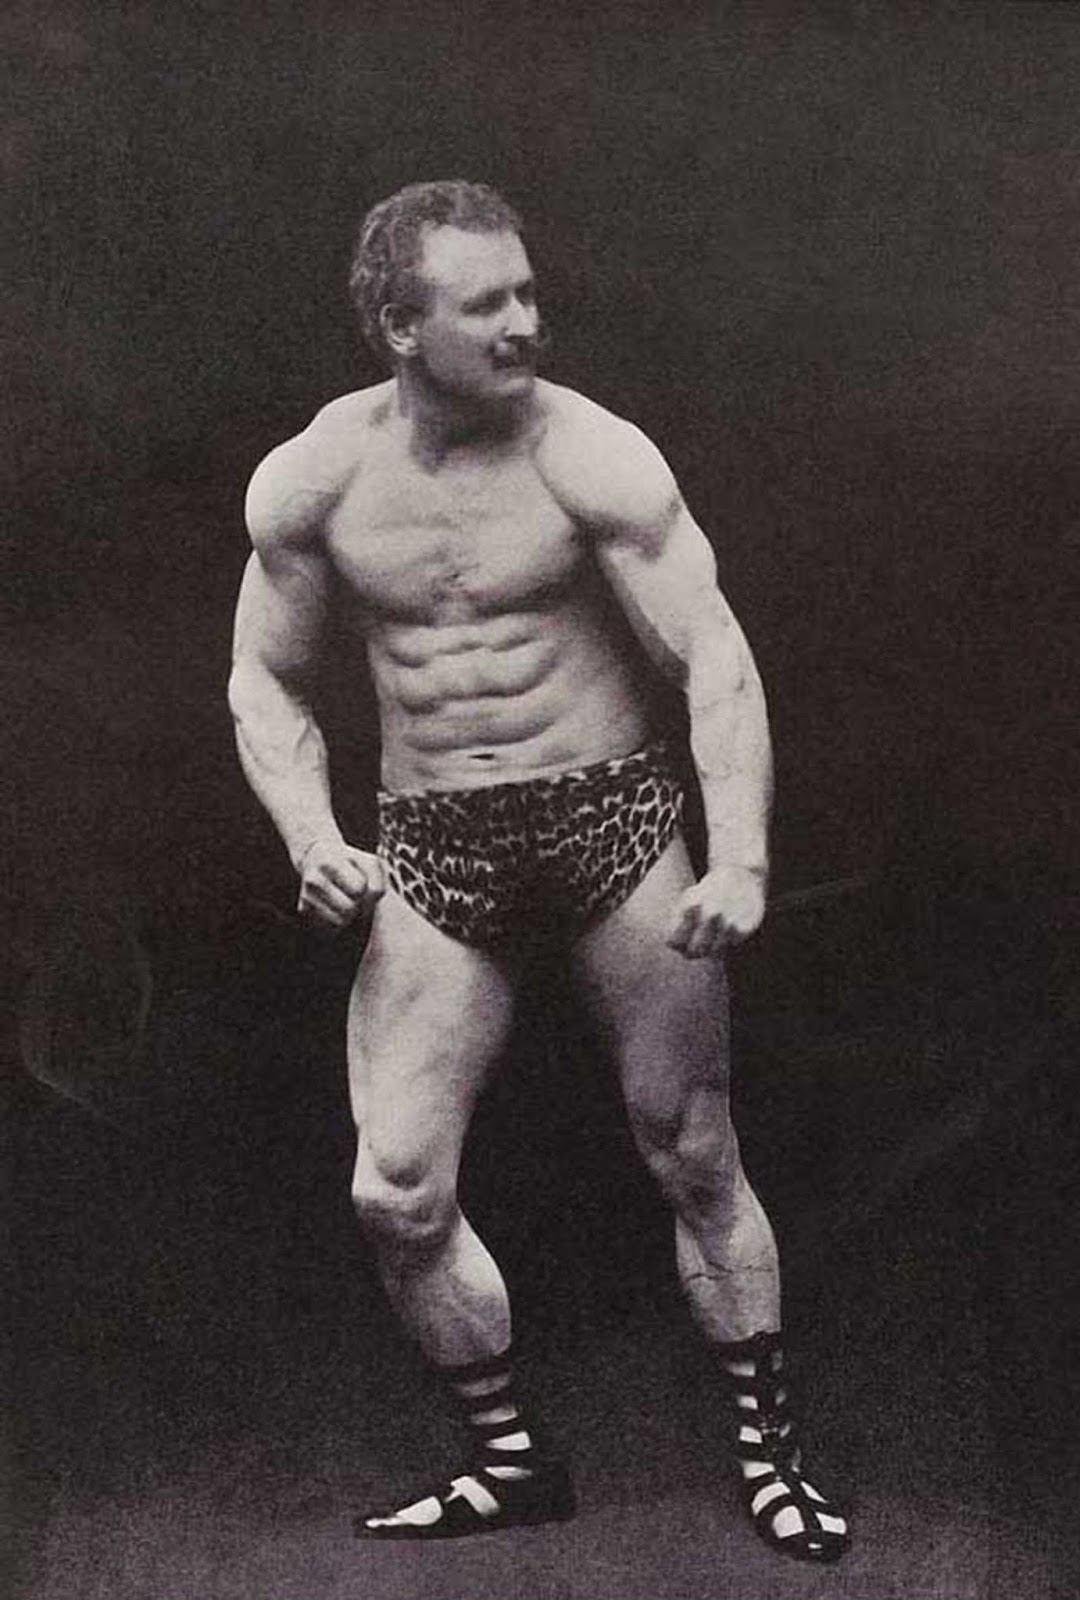 Eugen Sandow, 1902.